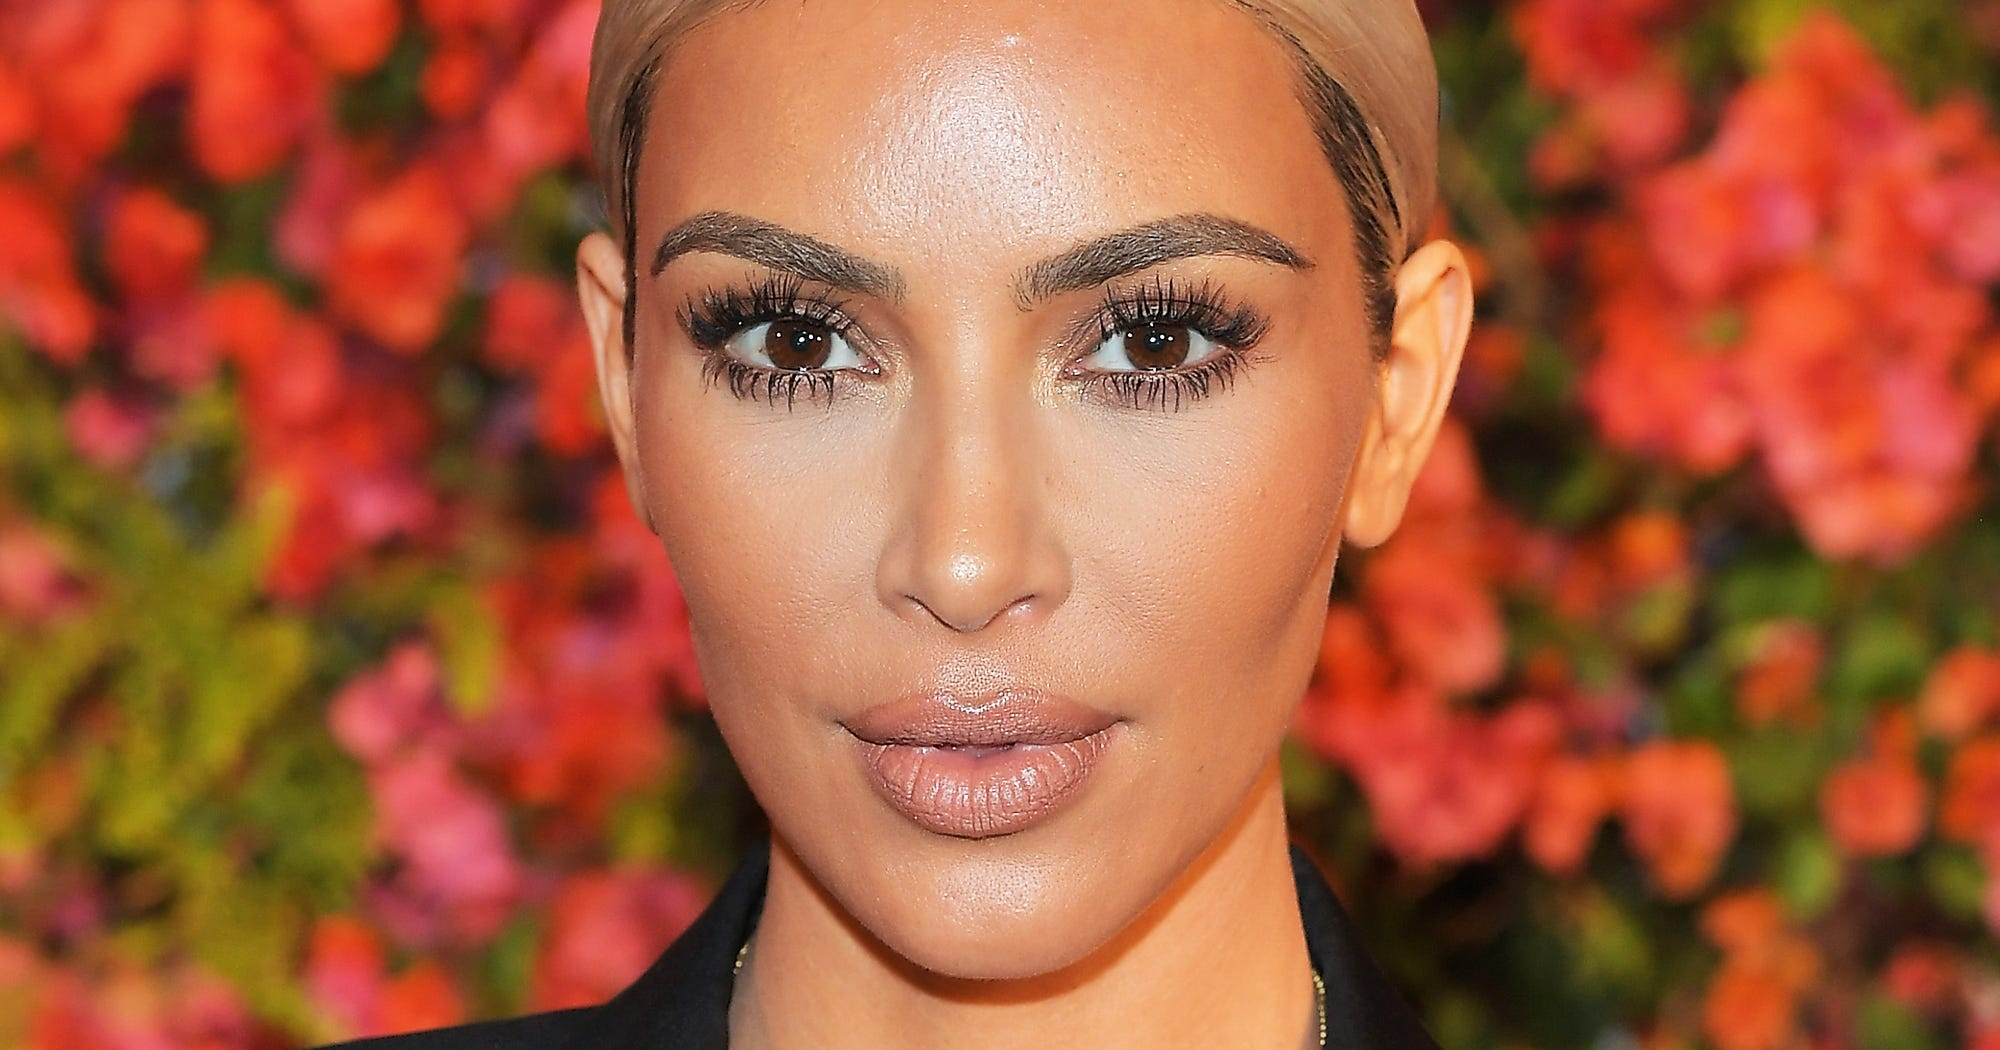 Kim Kardashian Last Will And Testament Hair Request